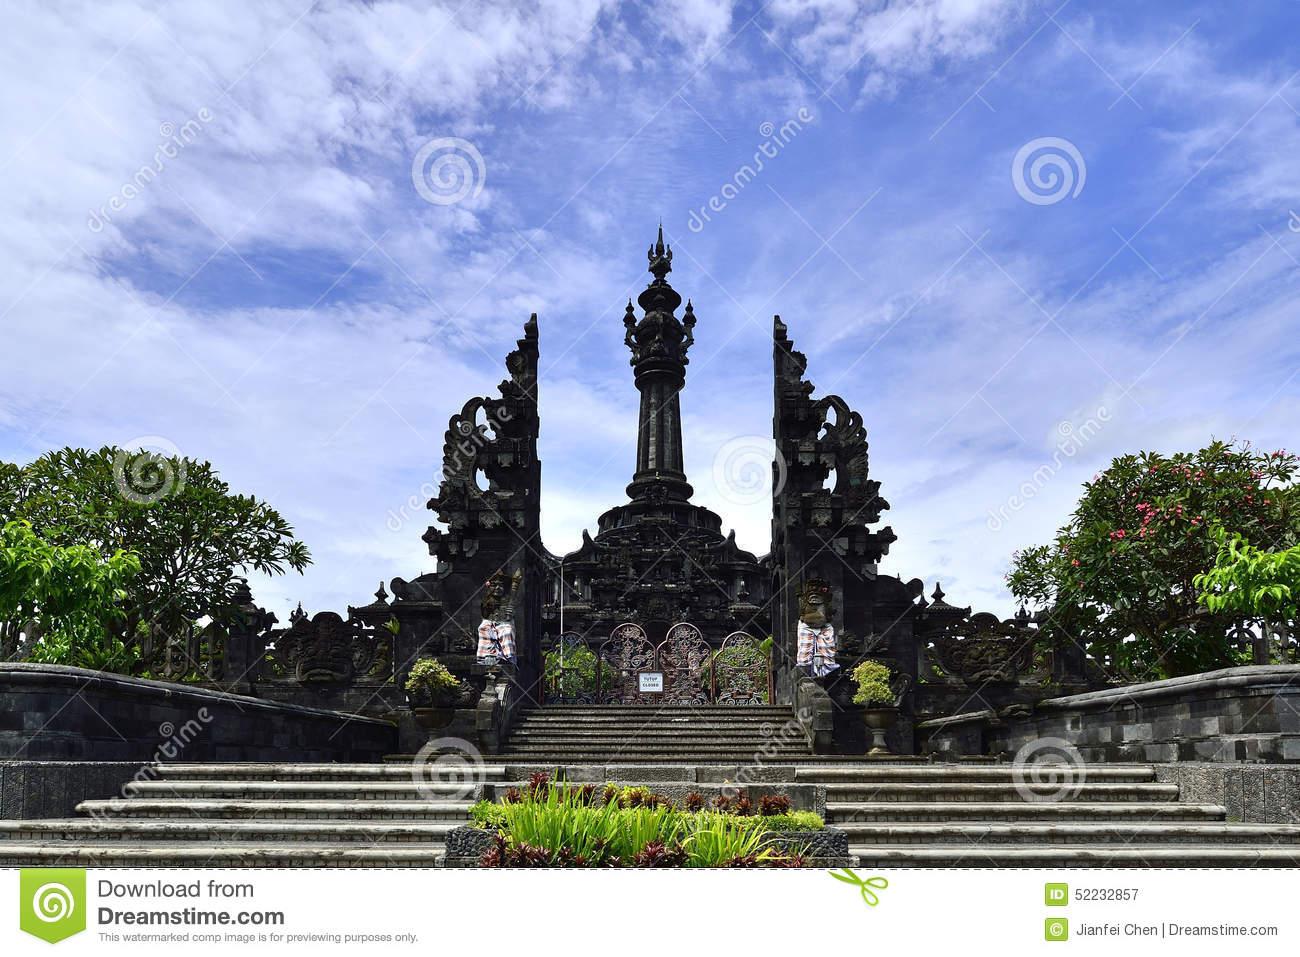 Monumen Perjuangan Rakyat Bali Stock Photo.